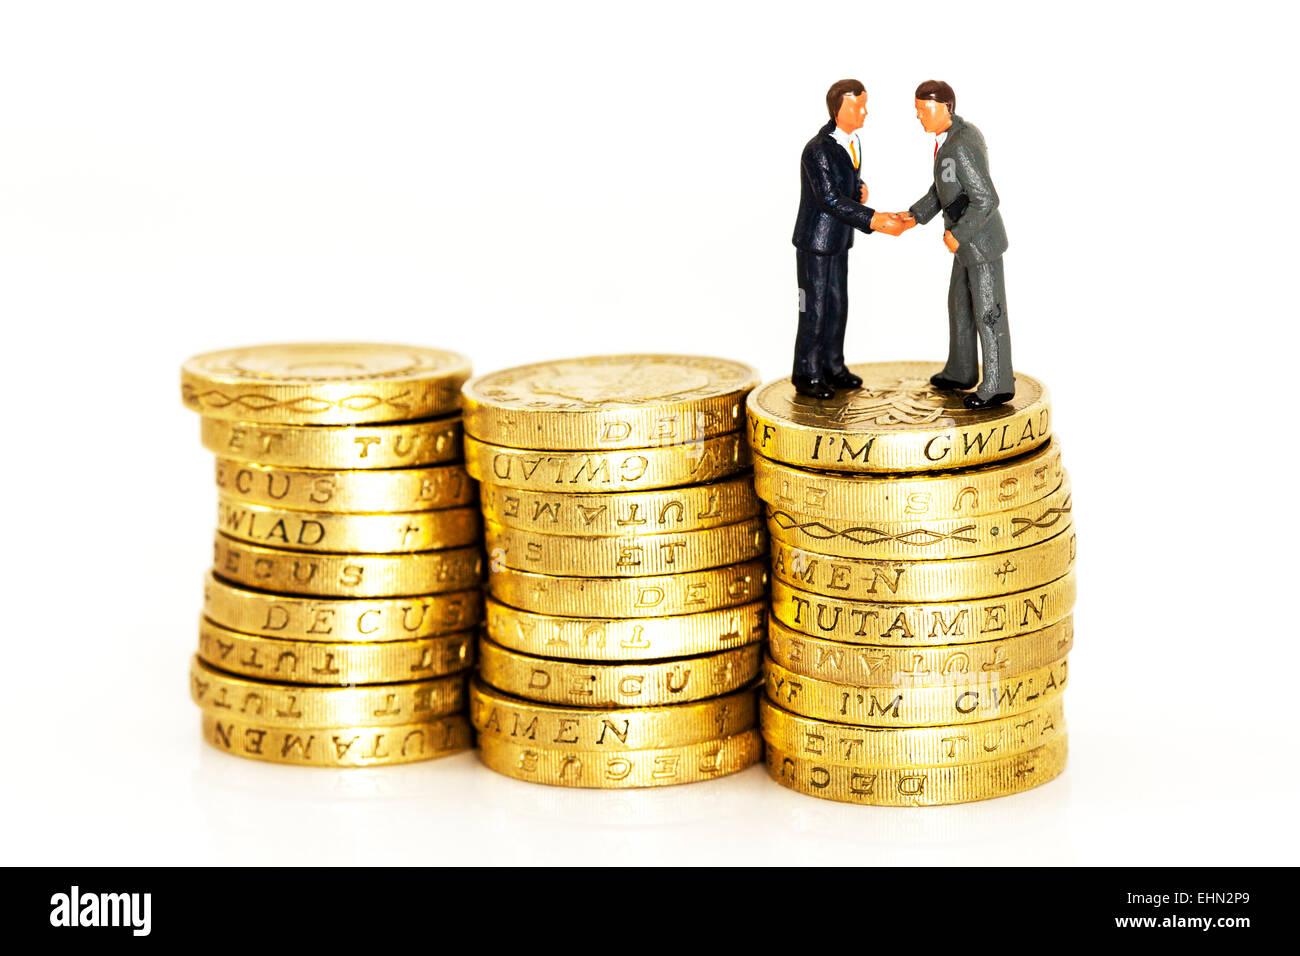 business businessman businessmen cash fat cats coins earnings executive executives finance financial man management - Stock Image